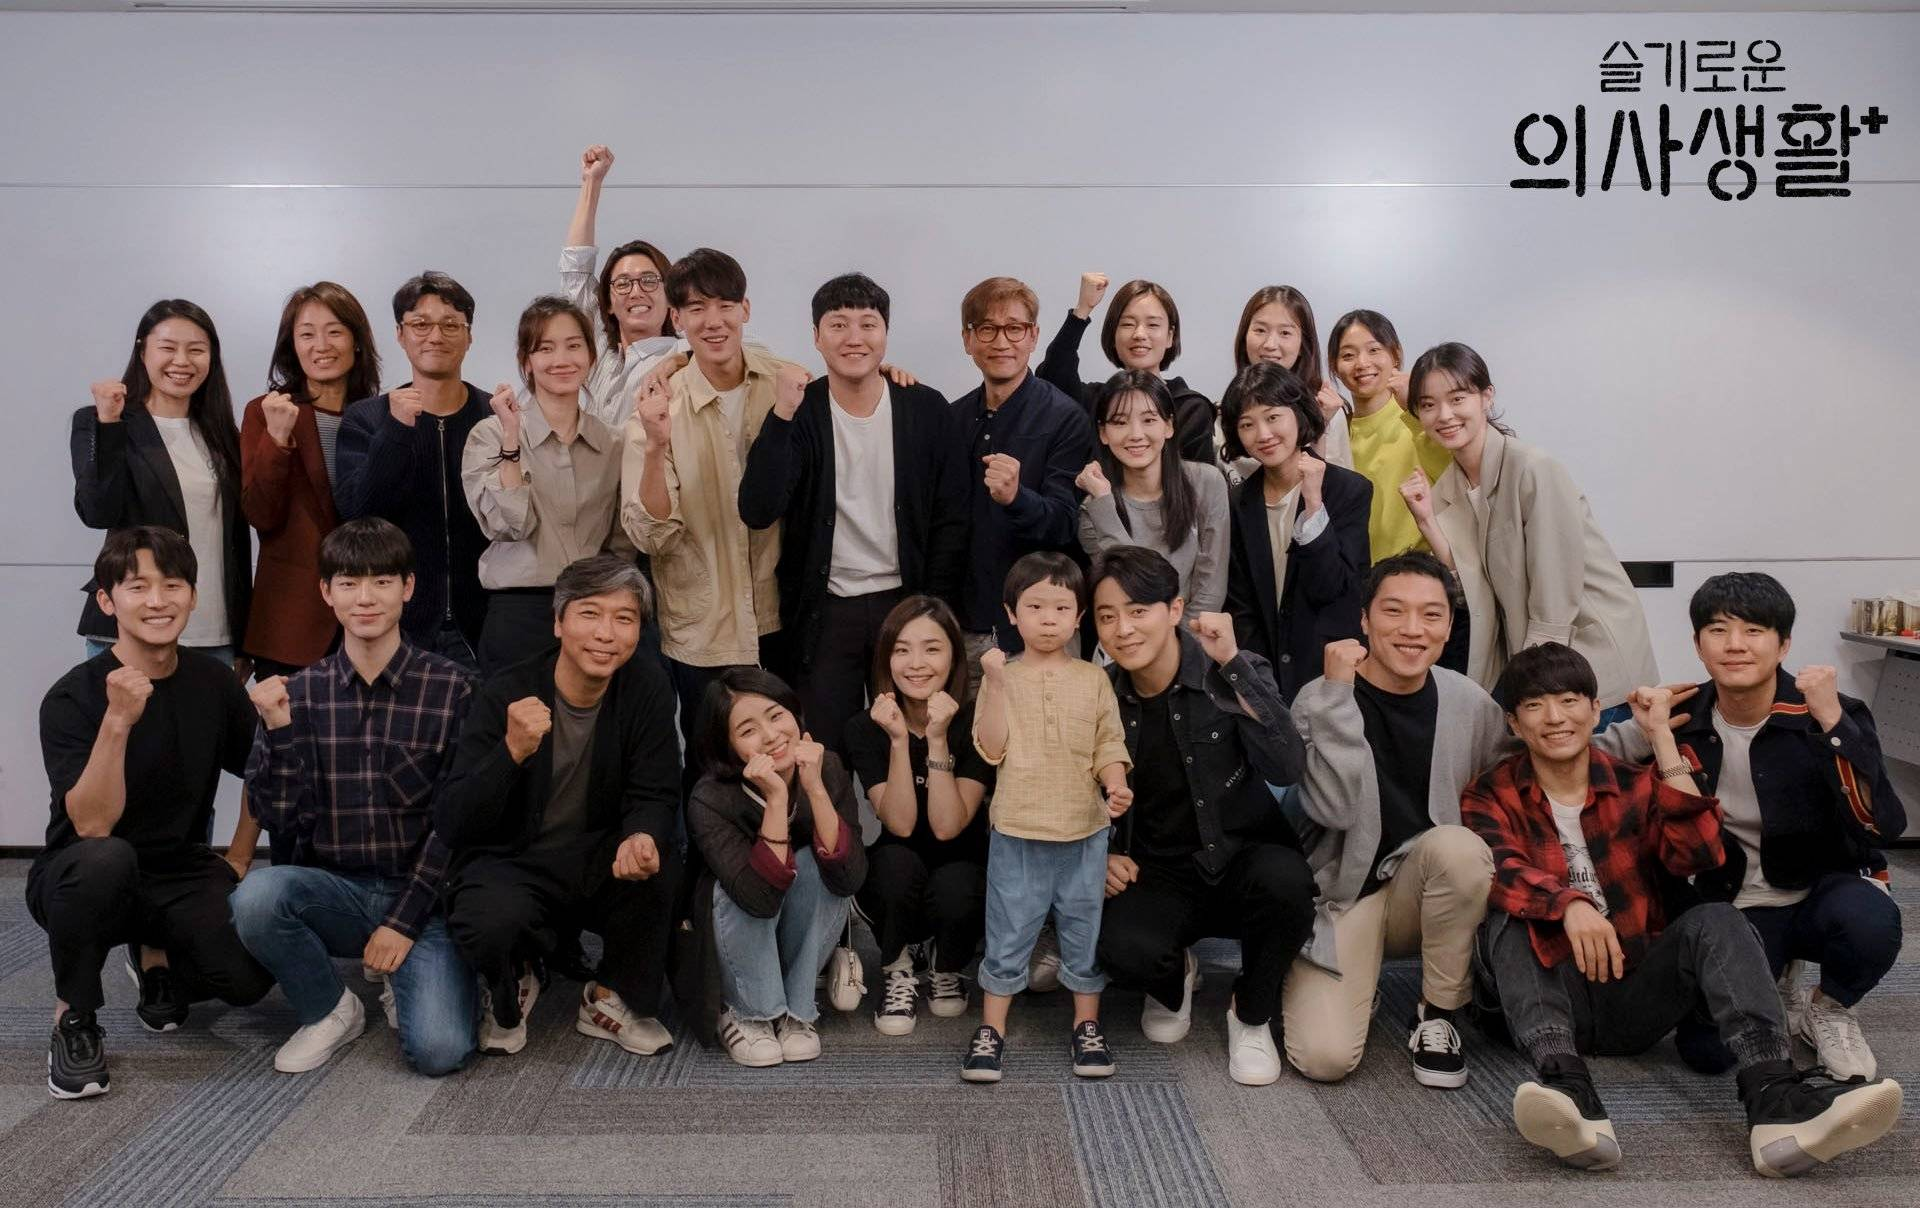 Hospital Playlist Cast Korean Drama 2020 슬기로운 의사생활